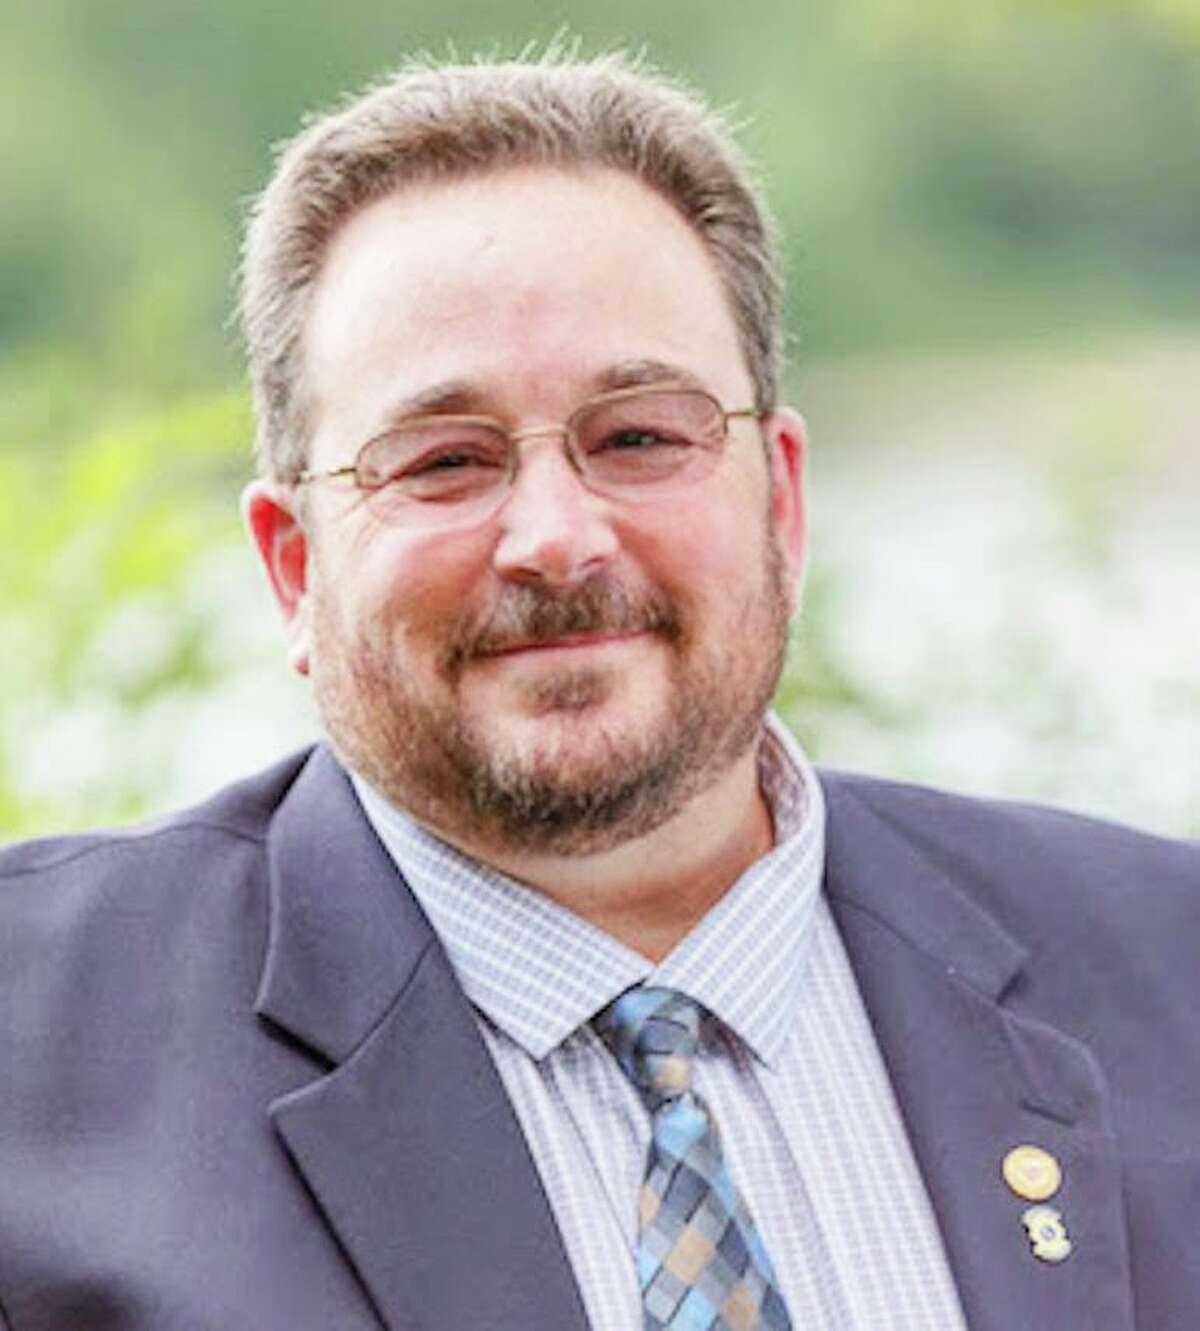 Portland Democrat, Selectman Jim Tripp, is running for first selectman.